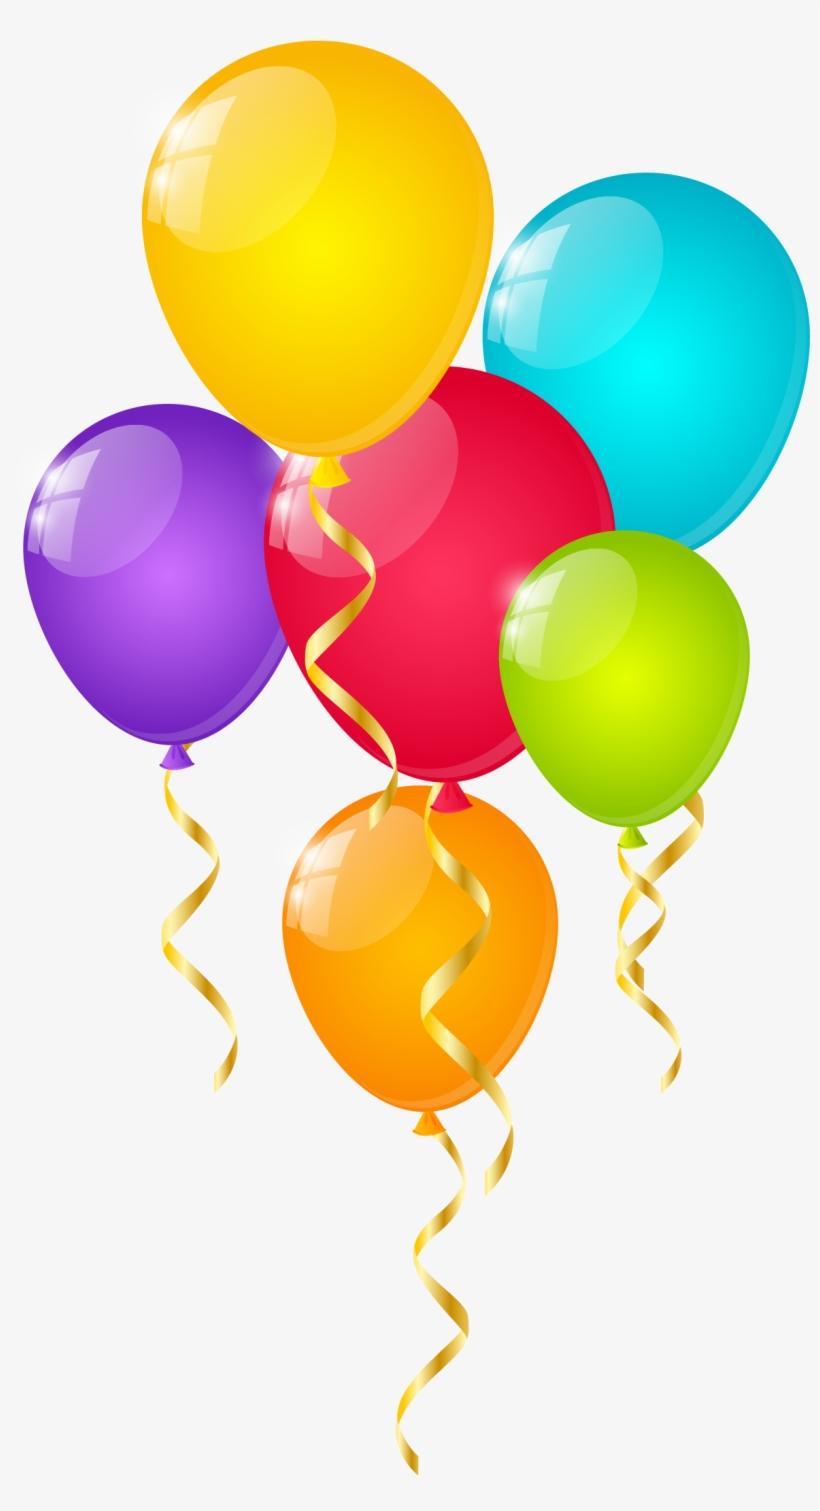 Imagen De Colores Cumplea Svg Globos De Cumpleanos Png Birthday Balloons Clipart Birthday Background Images Balloon Illustration